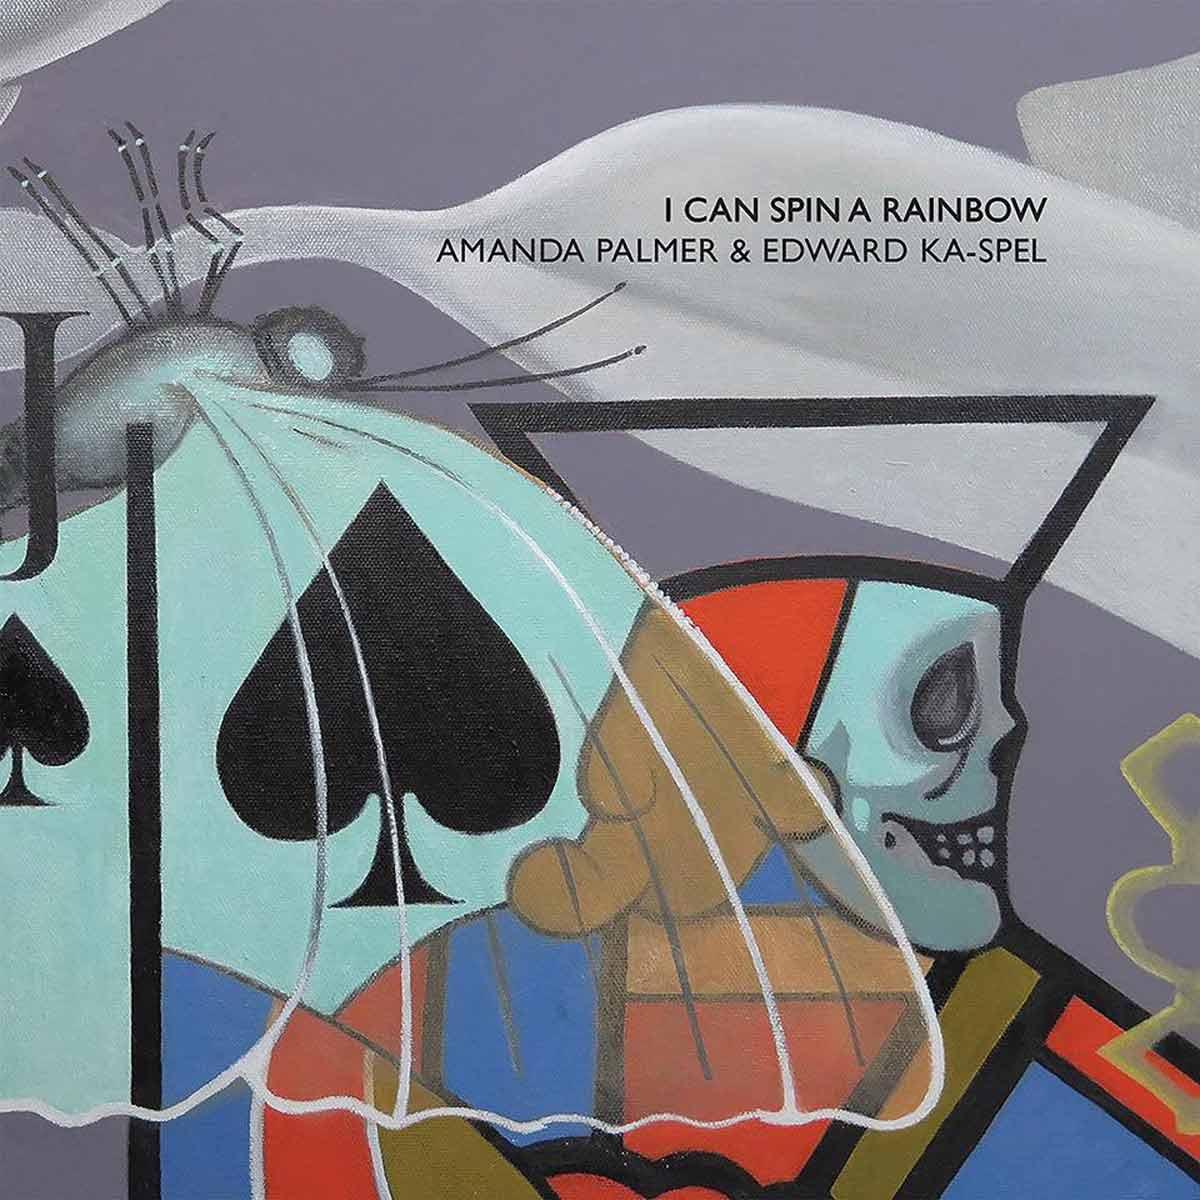 AMANDA PALMER & EDWARD KA-SPEL-I Can Spin A Rainbow